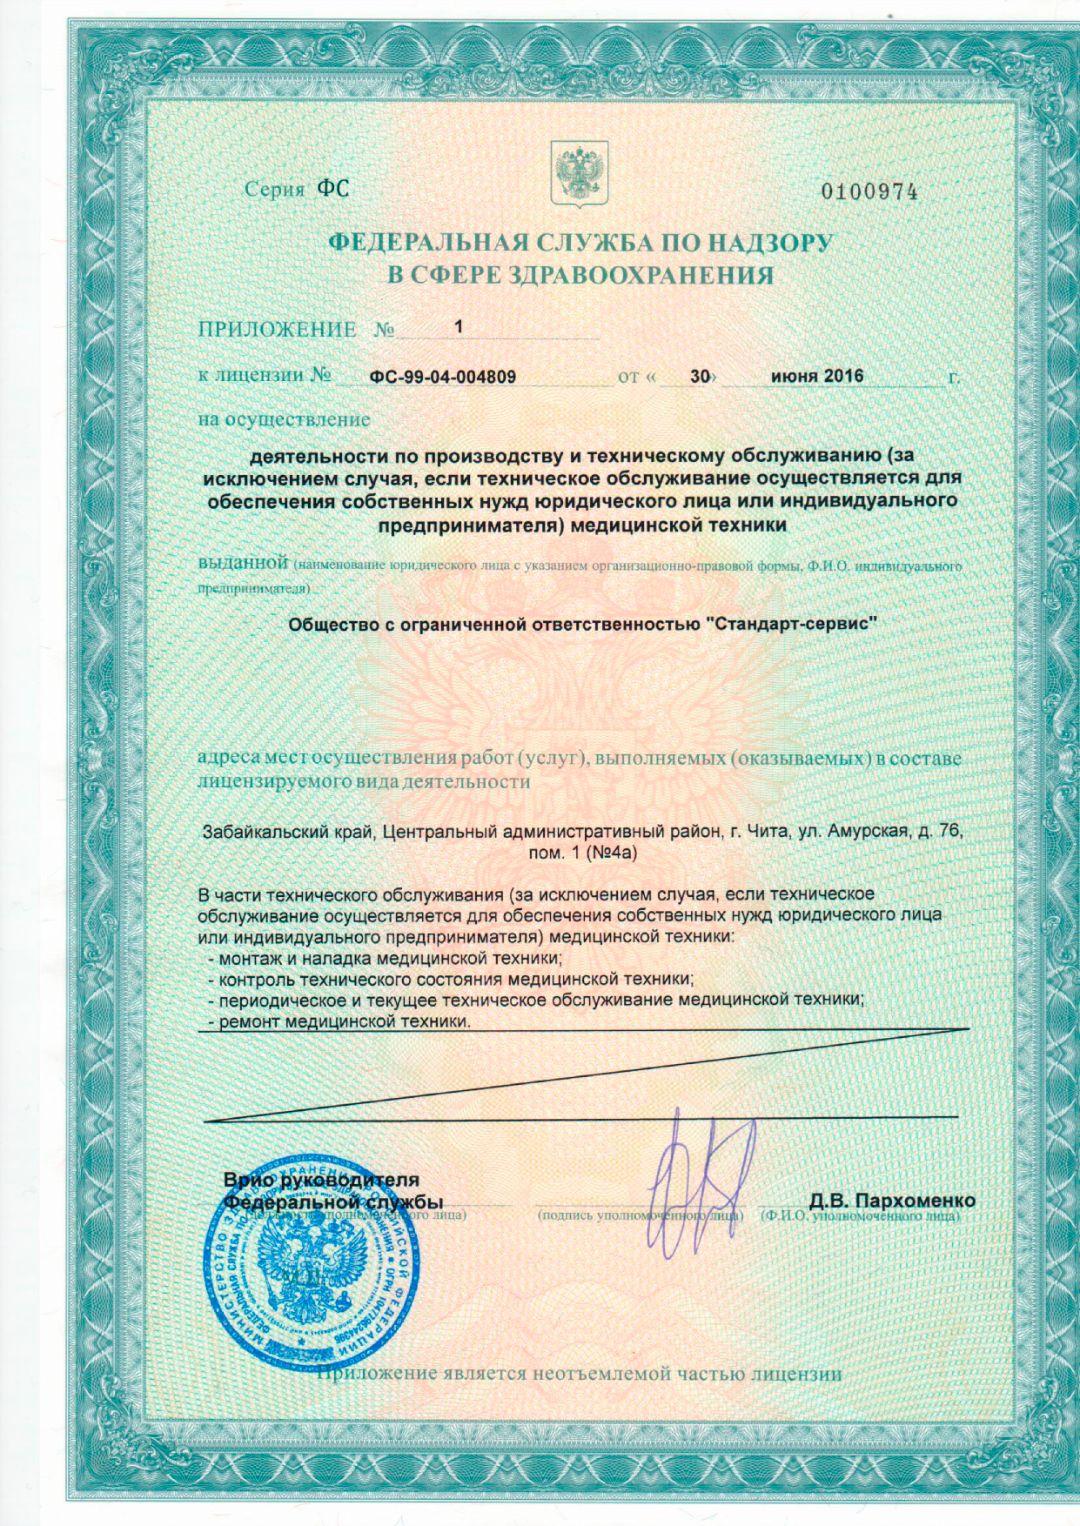 Лицензия на обслуживание медицинской техники 3 стр.